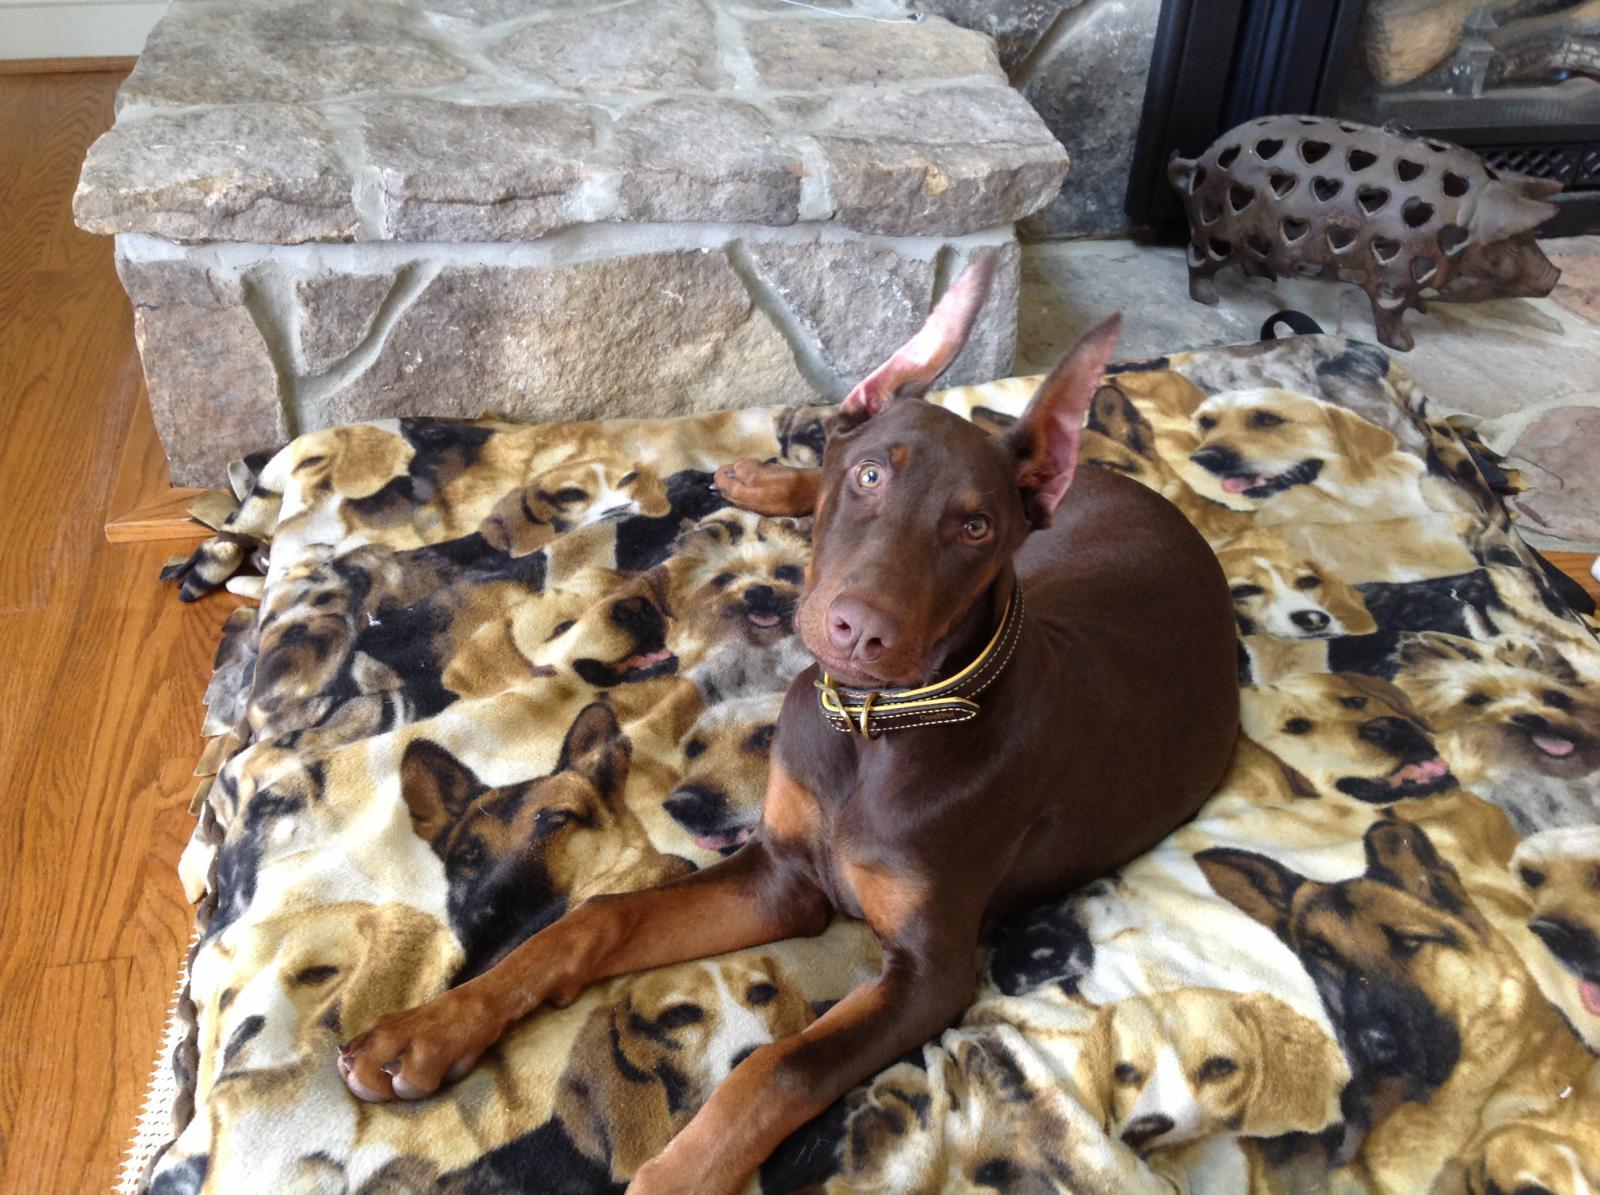 Cute Doberman Puppies For Sale In Texas Craigslist ...